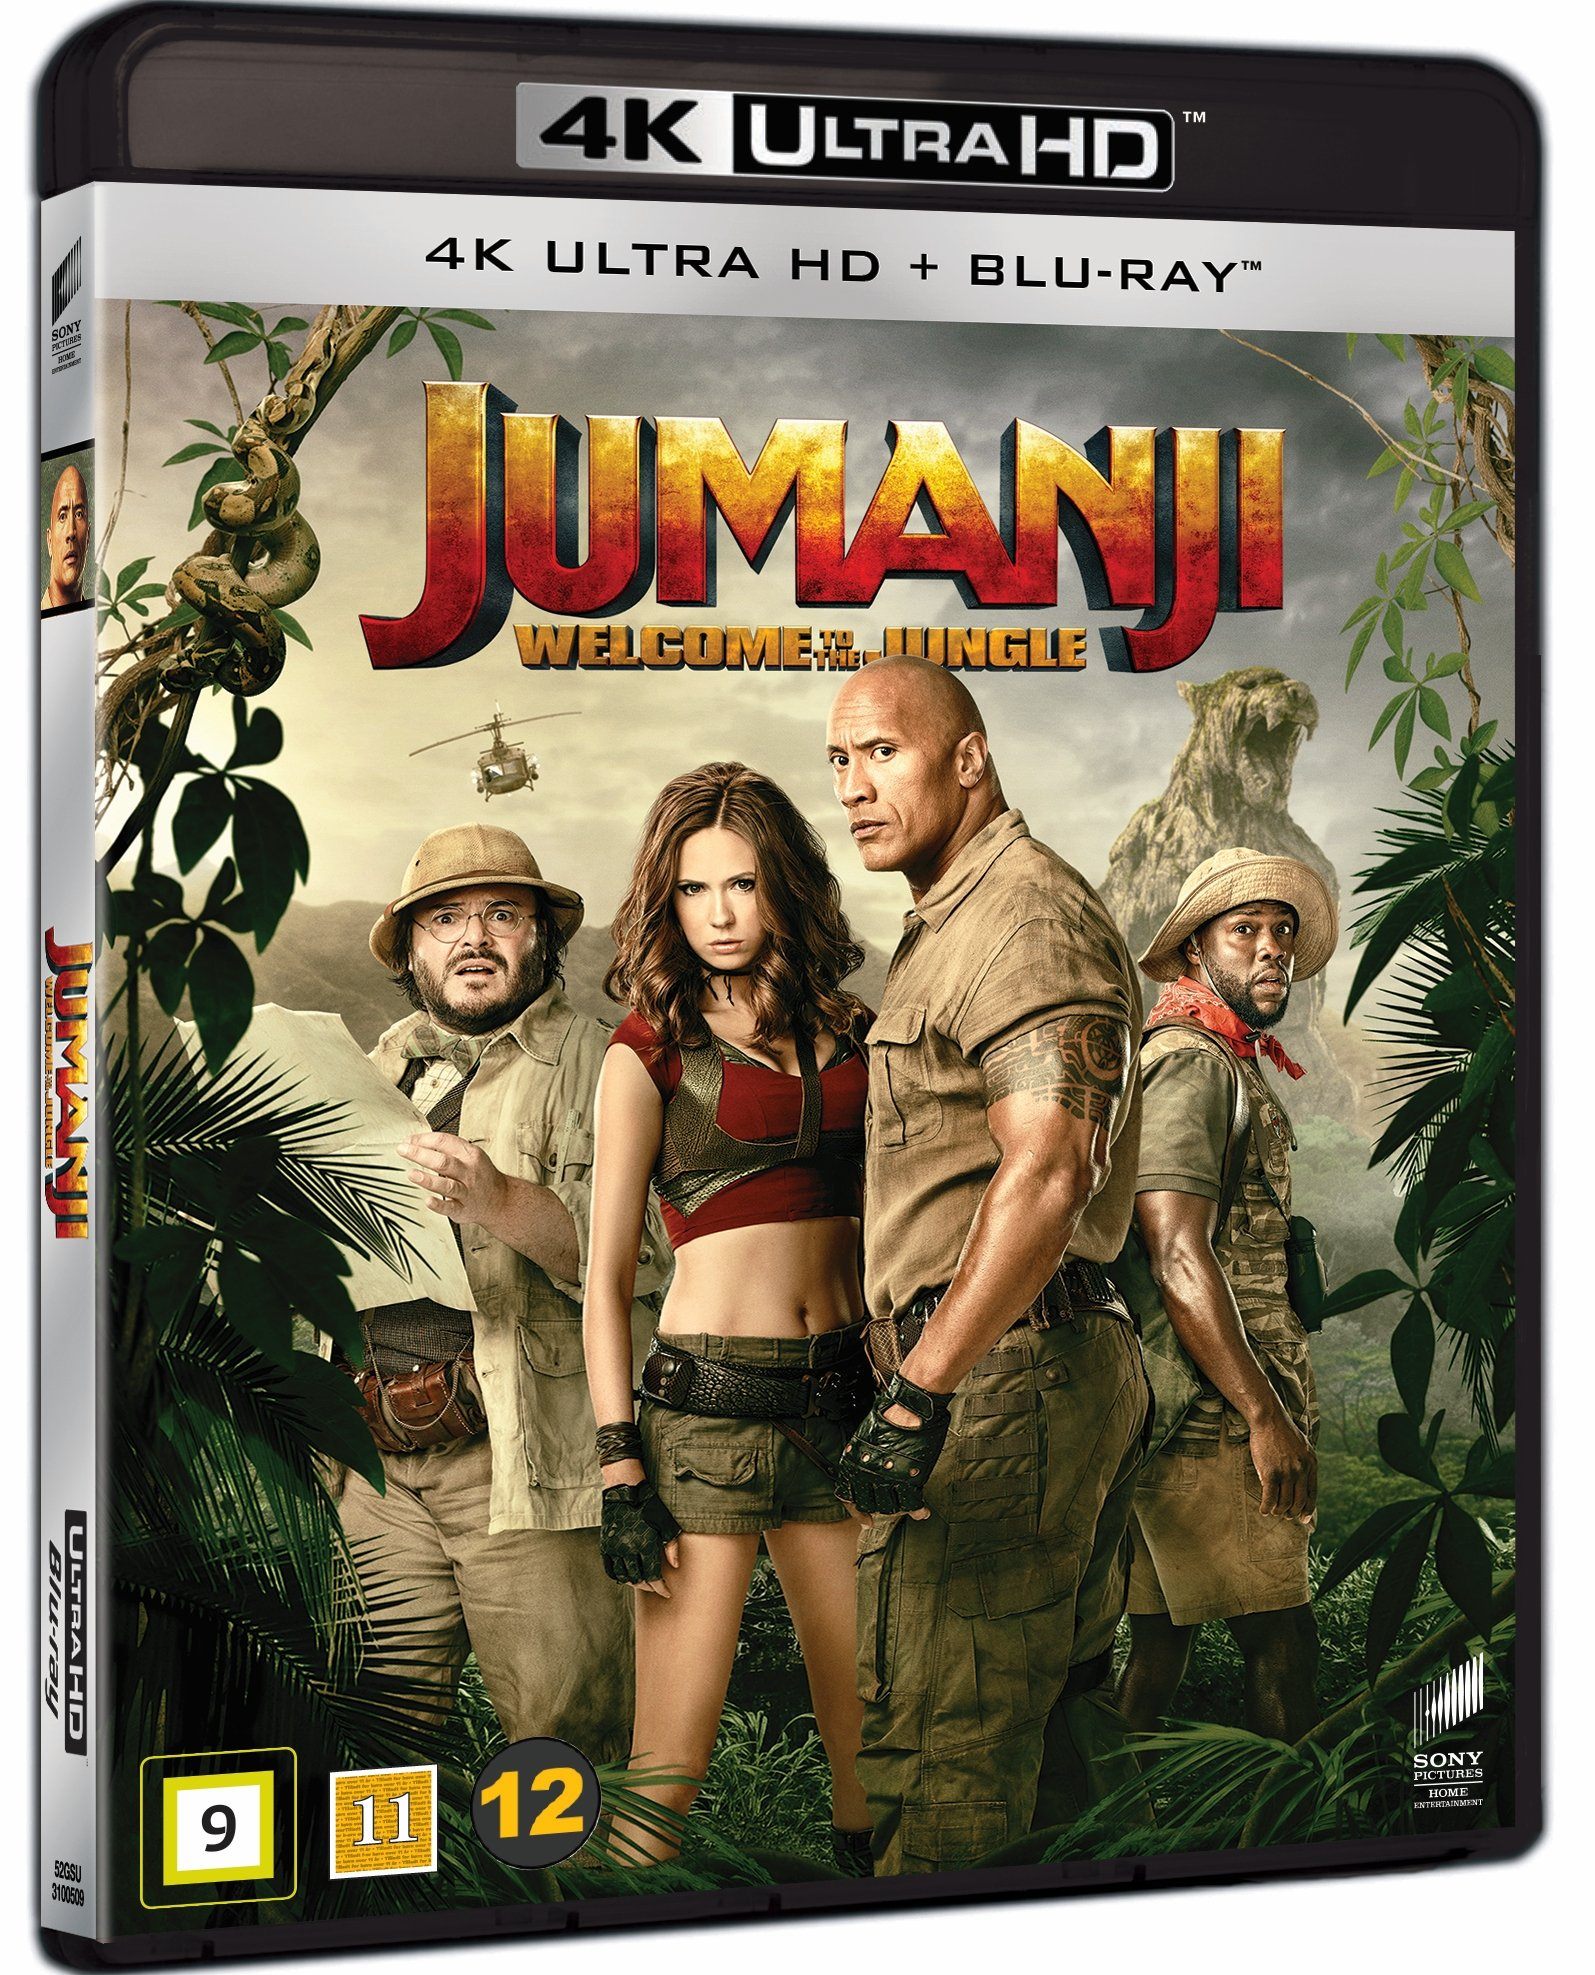 Jumanji: Welcome to the Jungle (4K Blu-Ray)